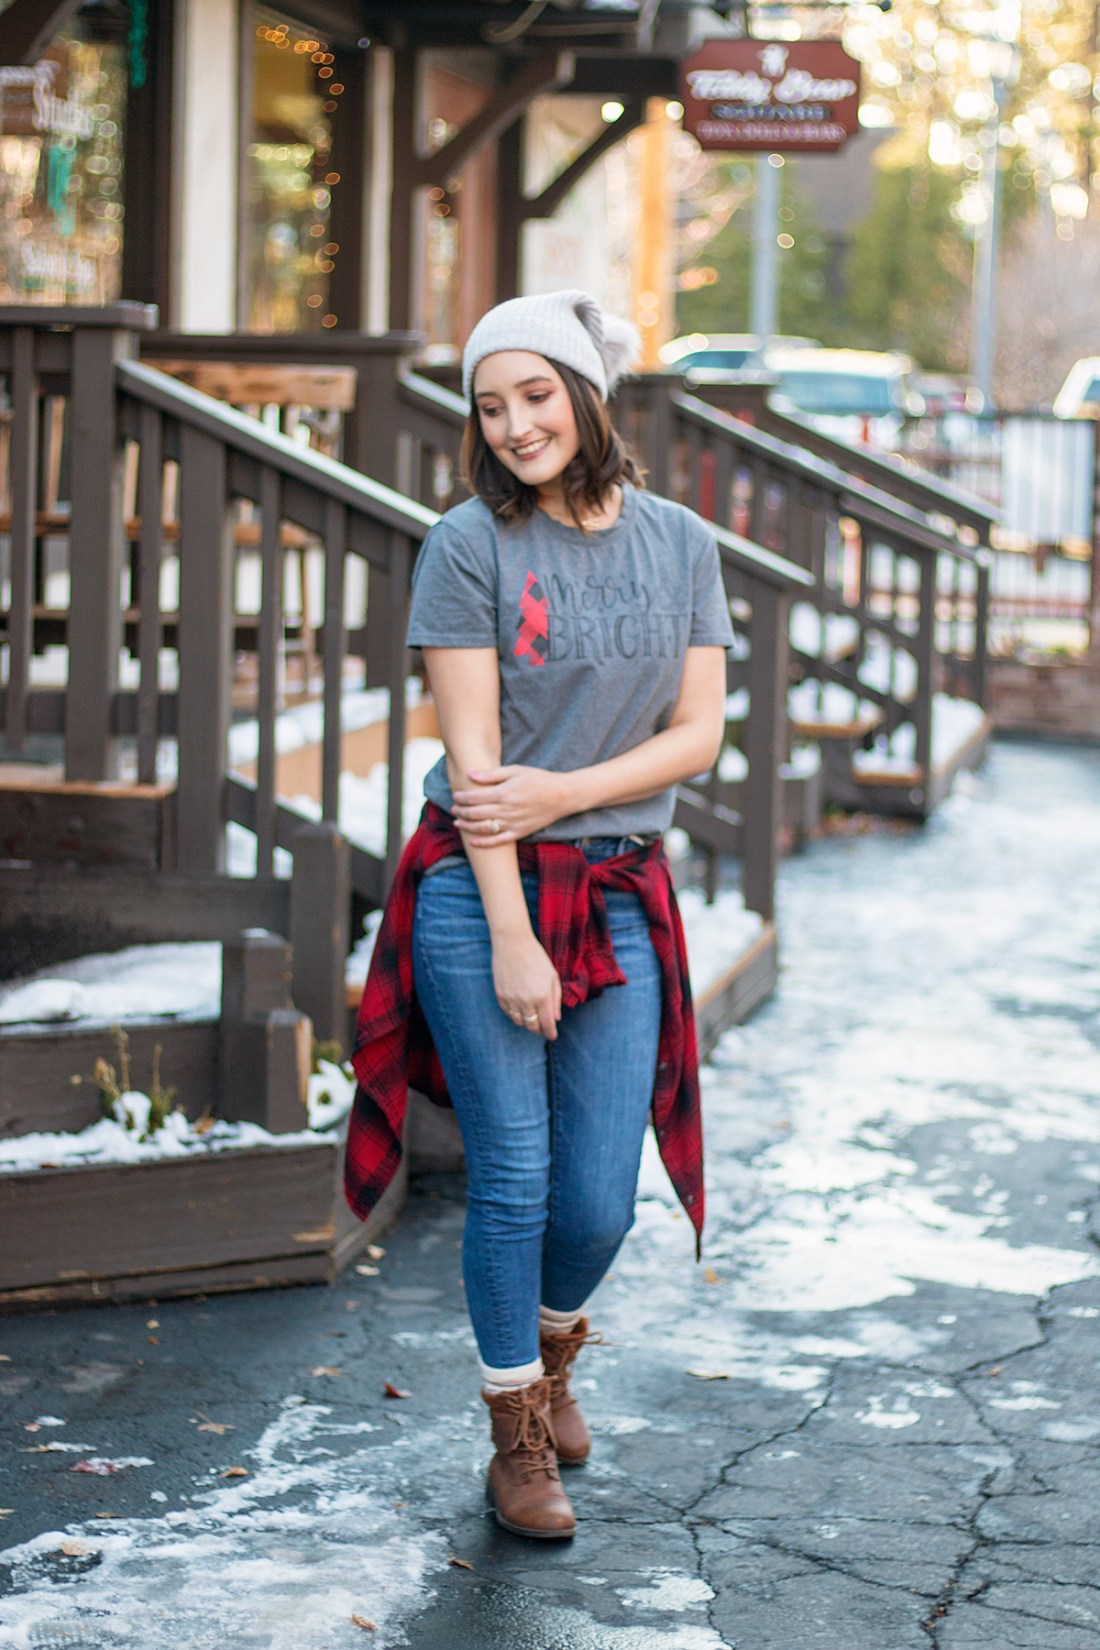 Christmas Graphic T-Shirt | A Good Hue